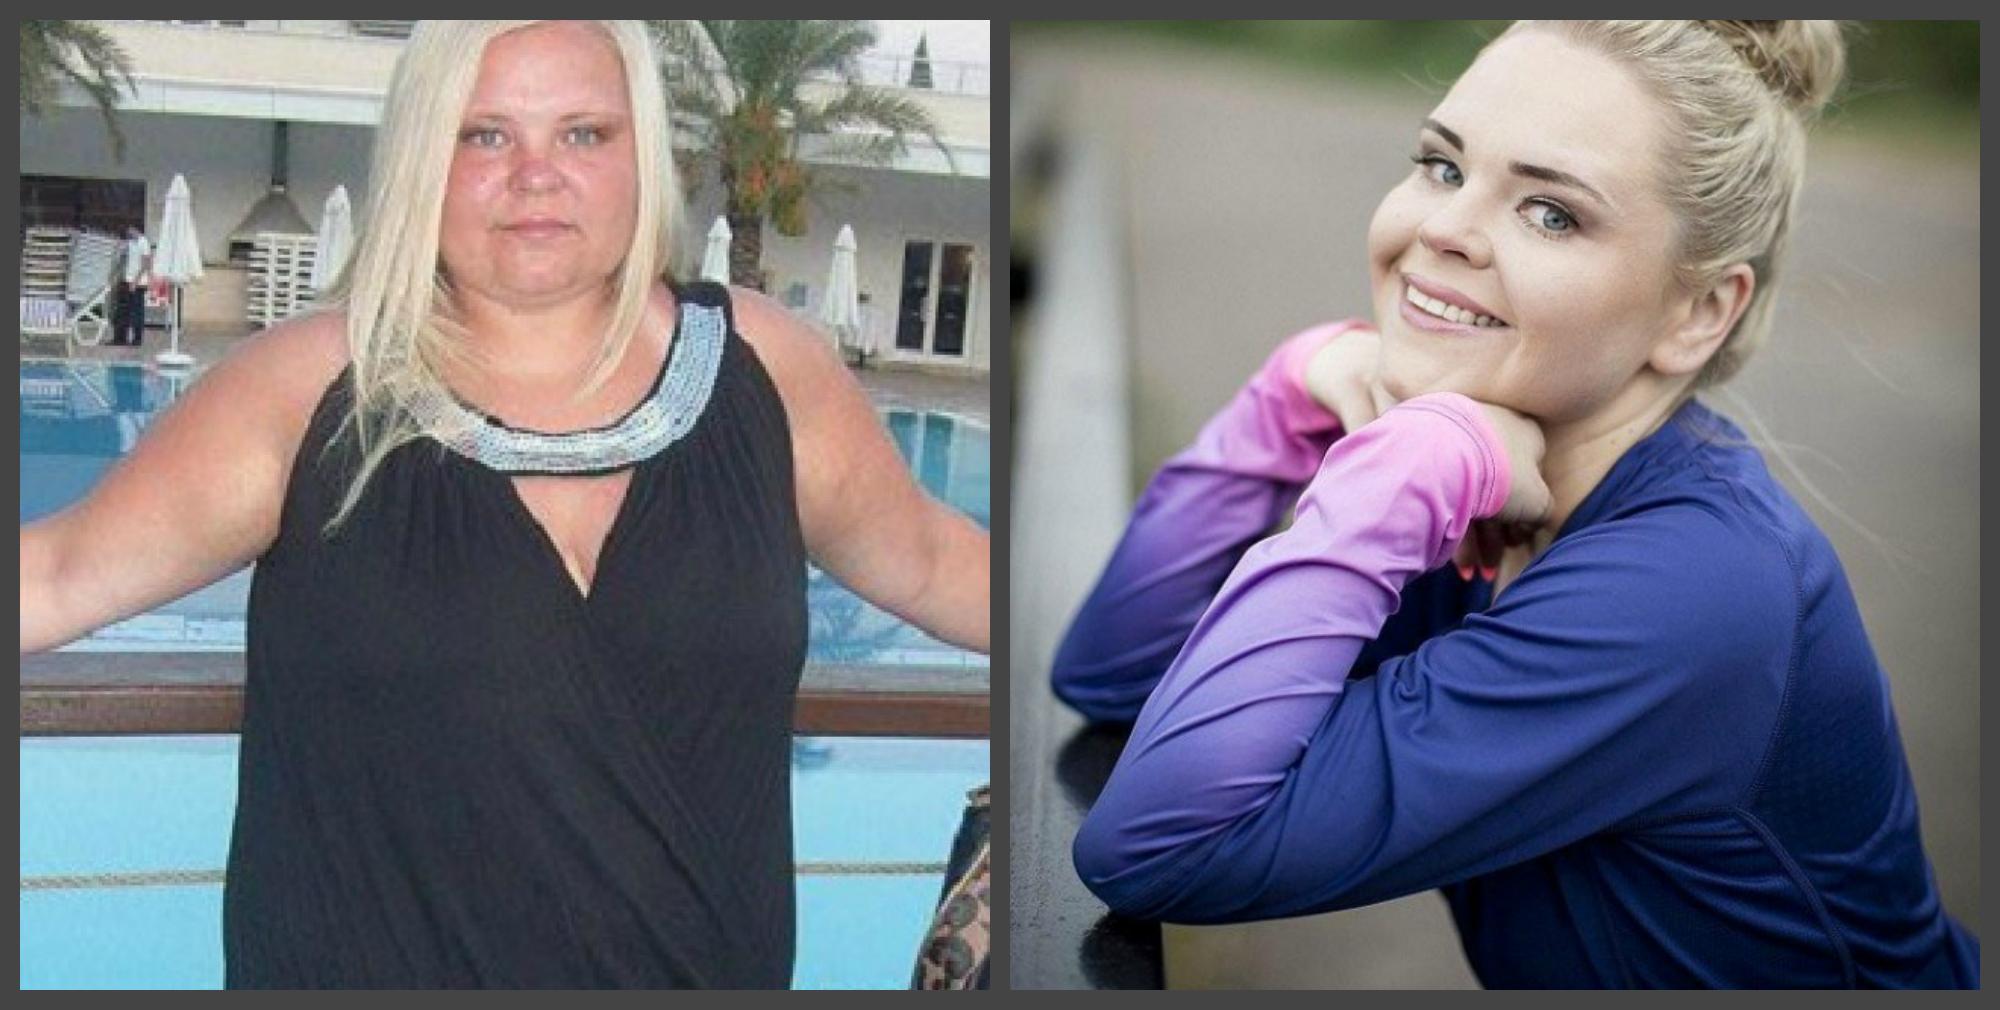 Ця дівчина схудла на 57 кг. А справа в незвичайному подарунку чоловіка … (ФОТО)